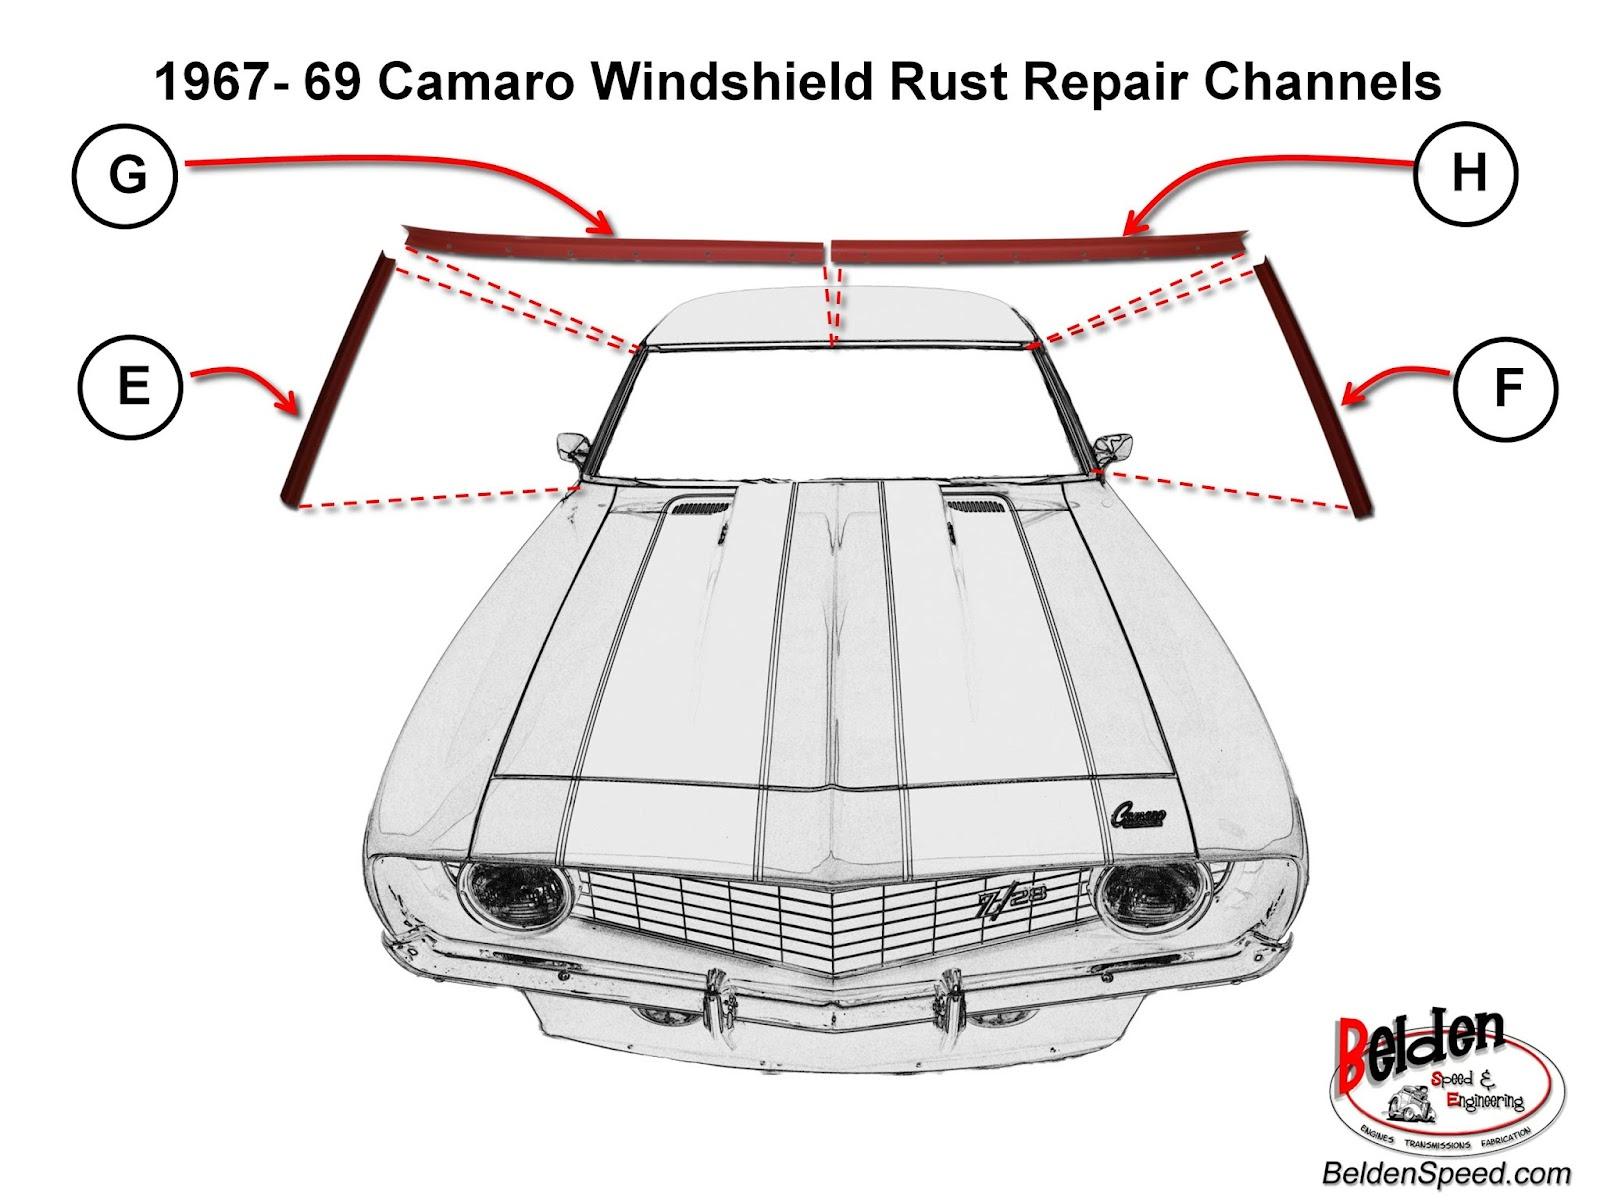 1981 Camaro Windshield And Rear Window Rust Repair